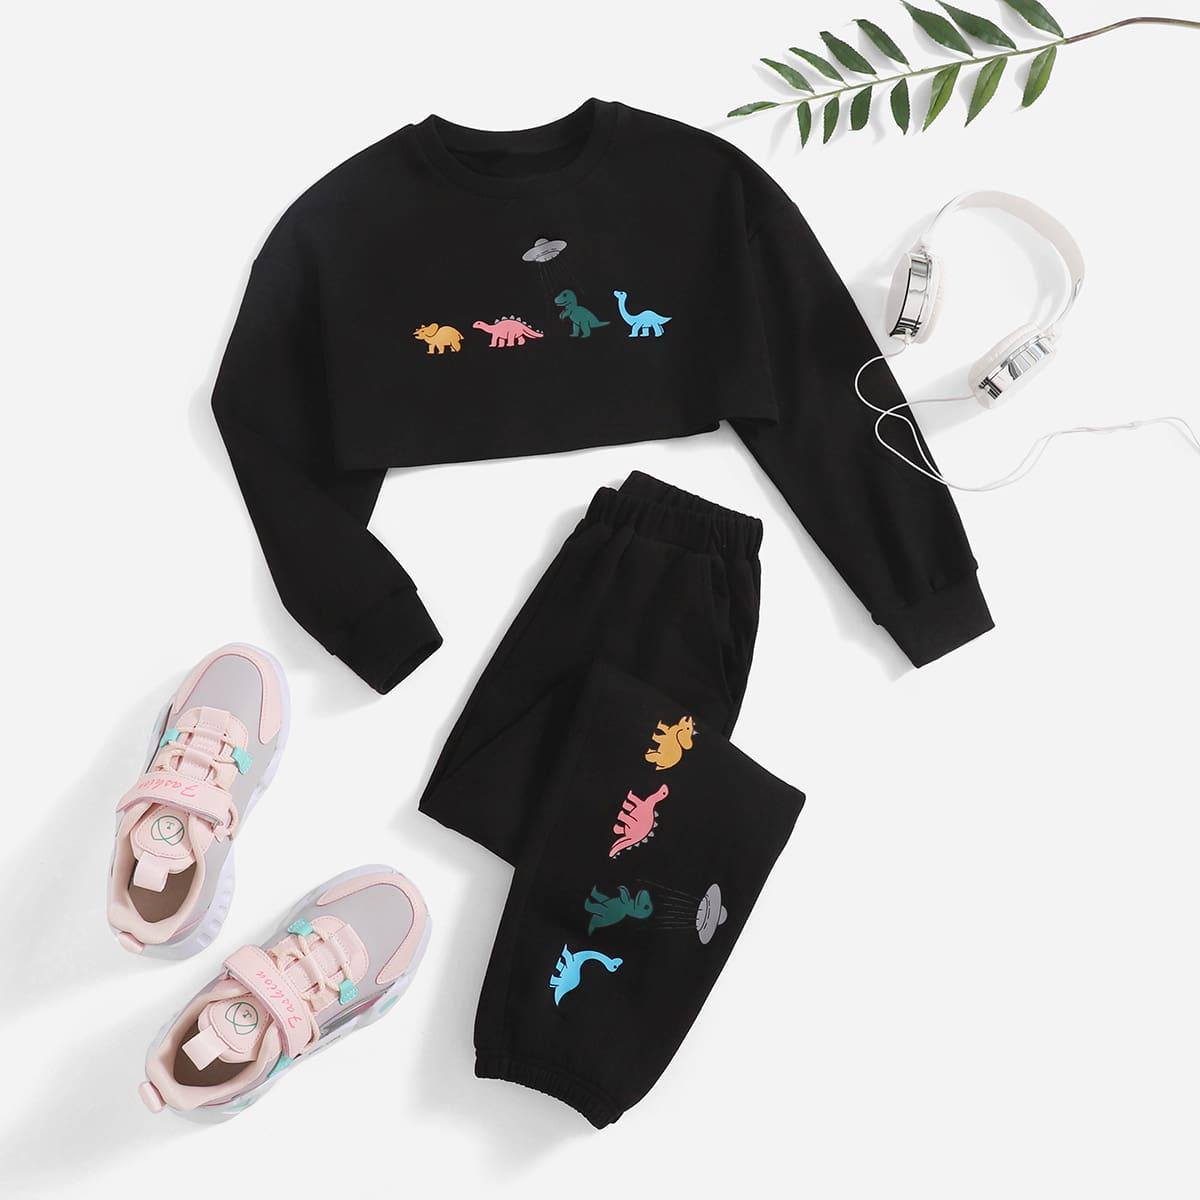 Girls Cartoon Graphic Crop Top & Sweatpants, SHEIN  - buy with discount